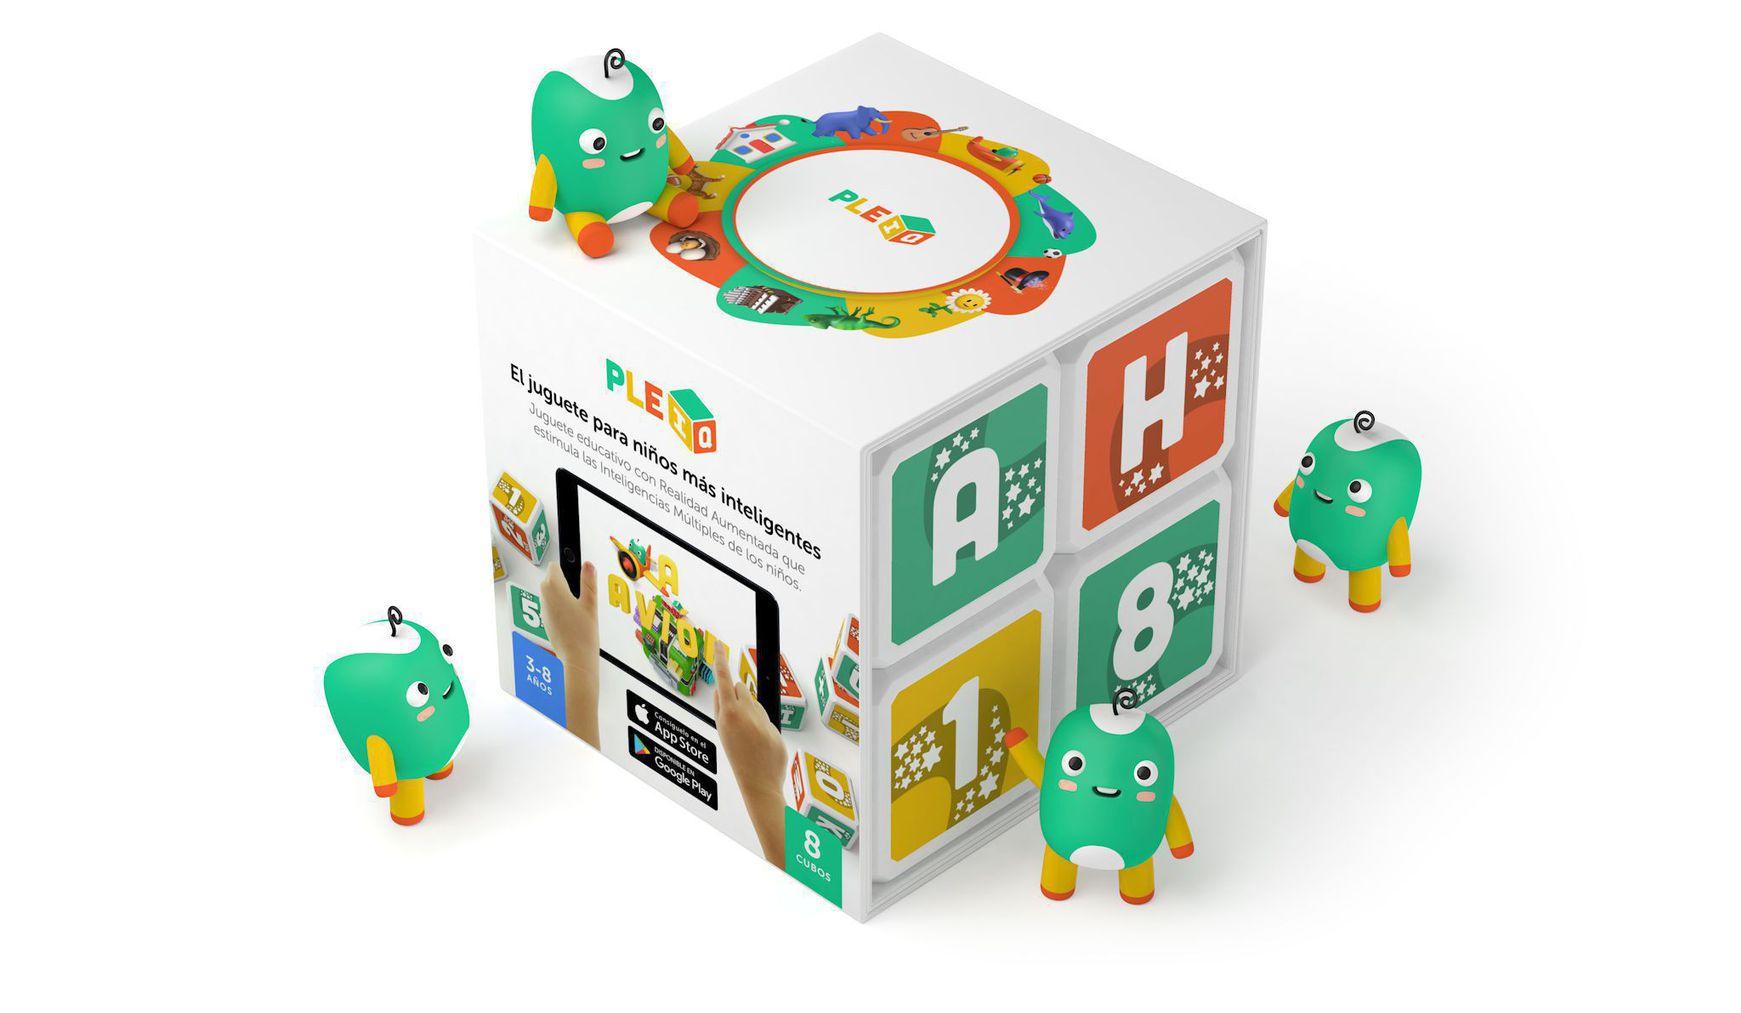 Pleiq box with cubes